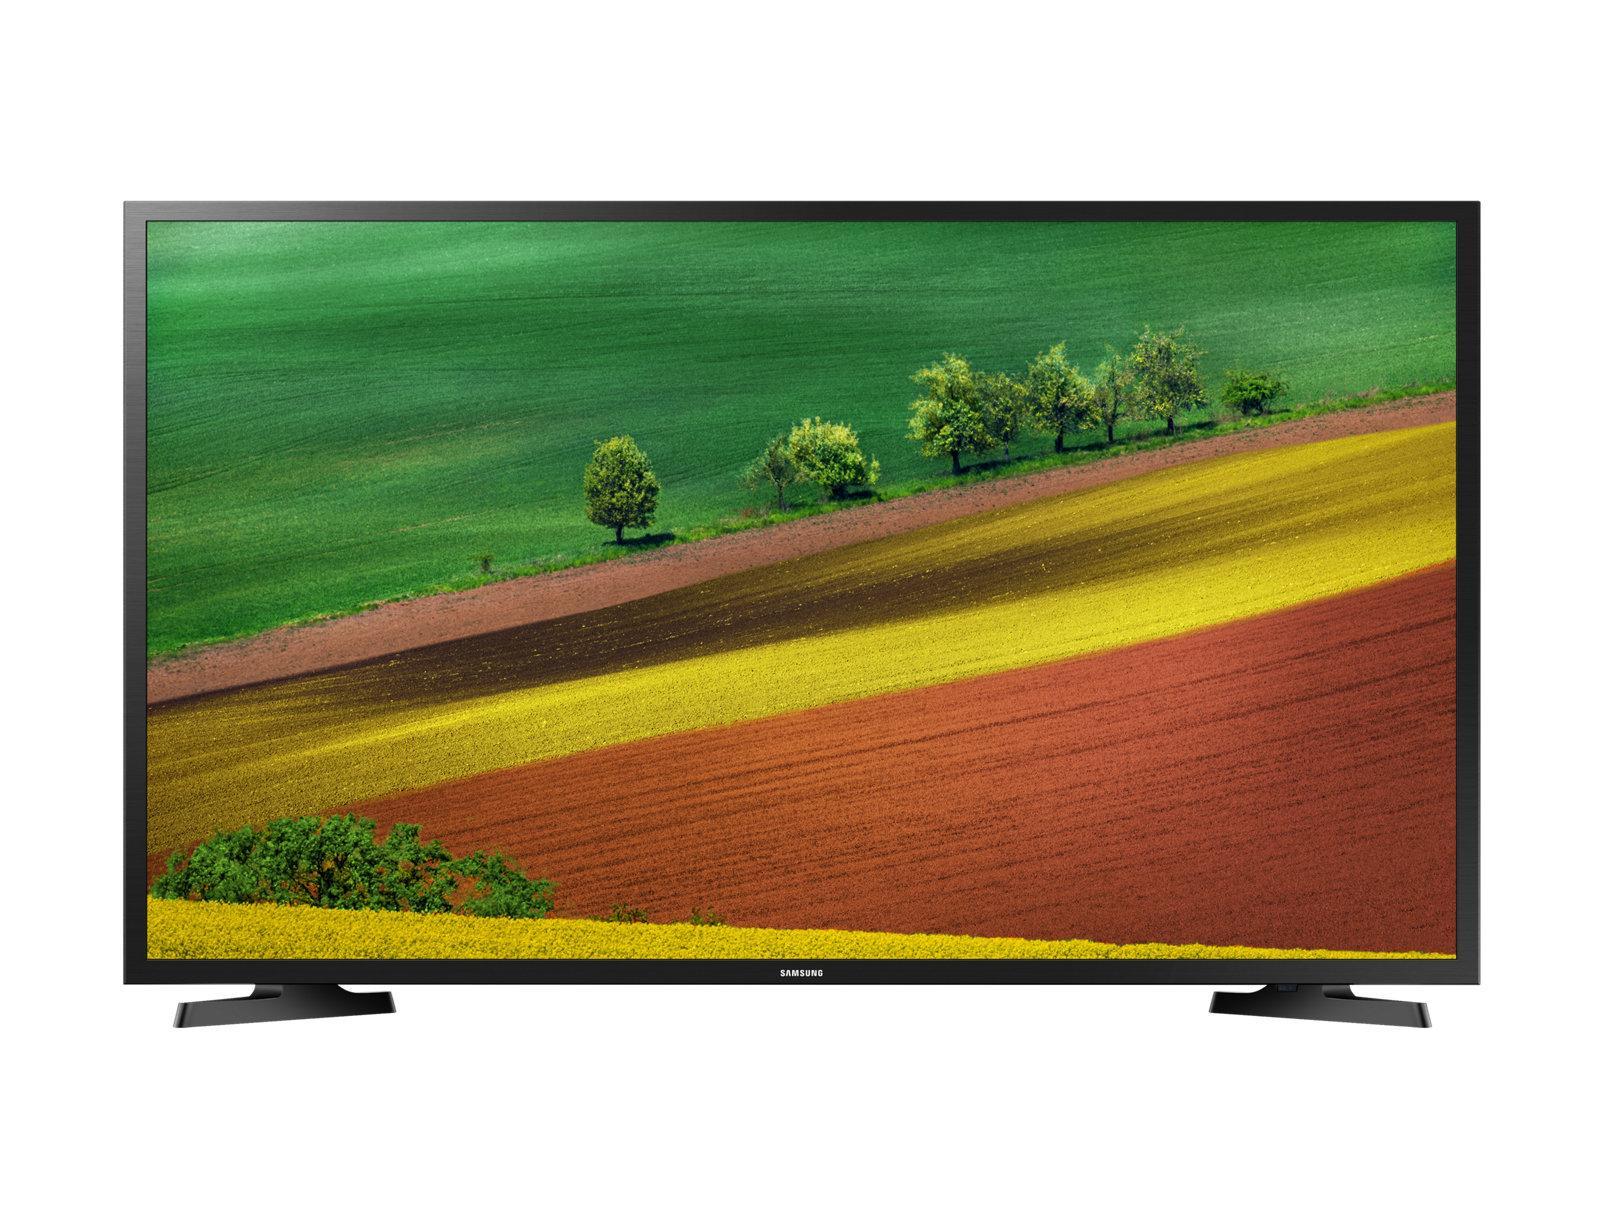 Tivi LED Samsung 32 inch HD - Model UA32N4000AKXXV